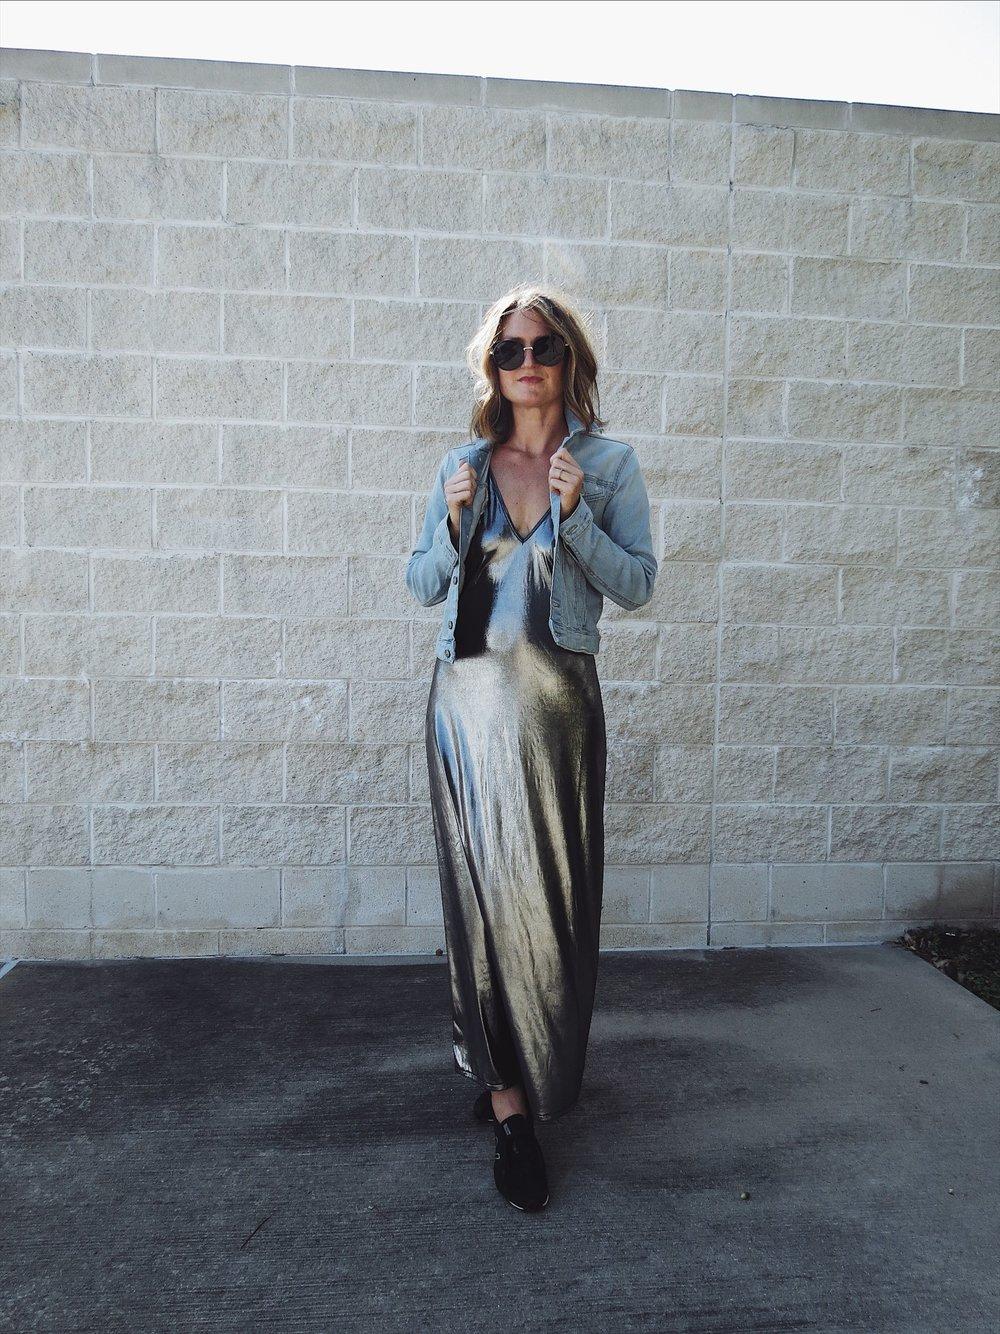 houston fashion blog, metallic slip dress, houston style blog, hey jode